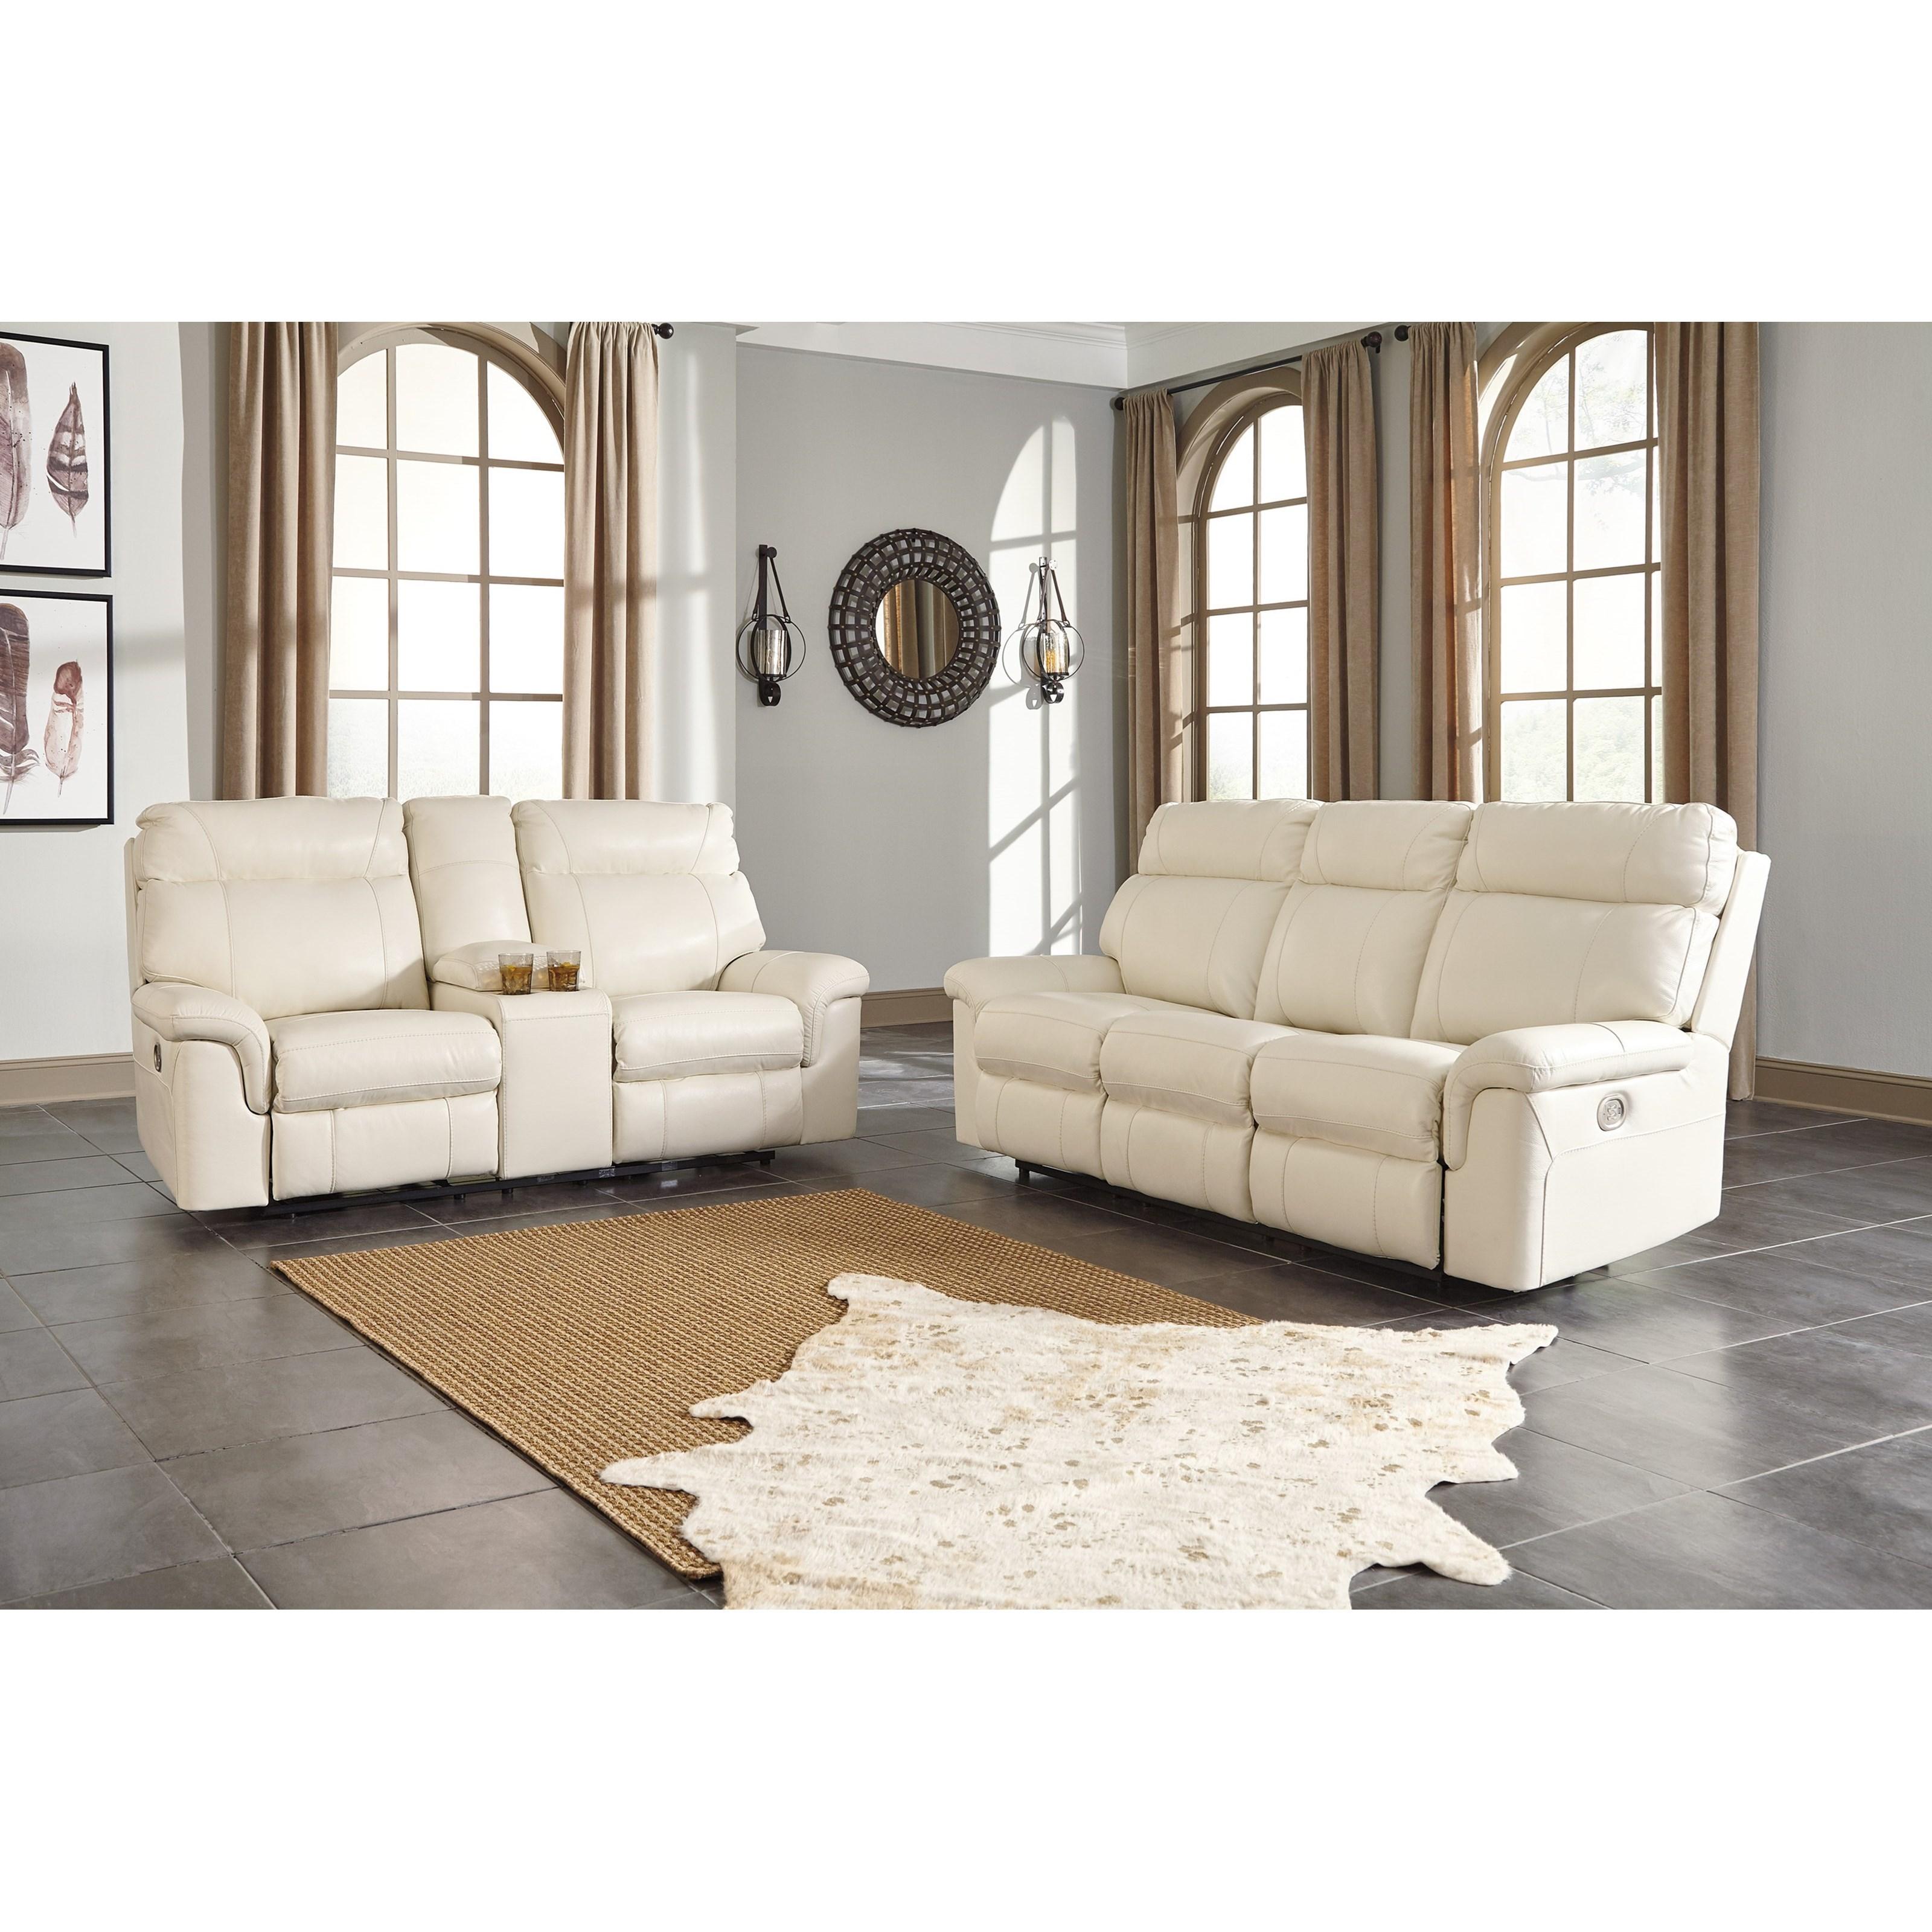 Millennium Whiteville Reclining Living Room Group | Household ...